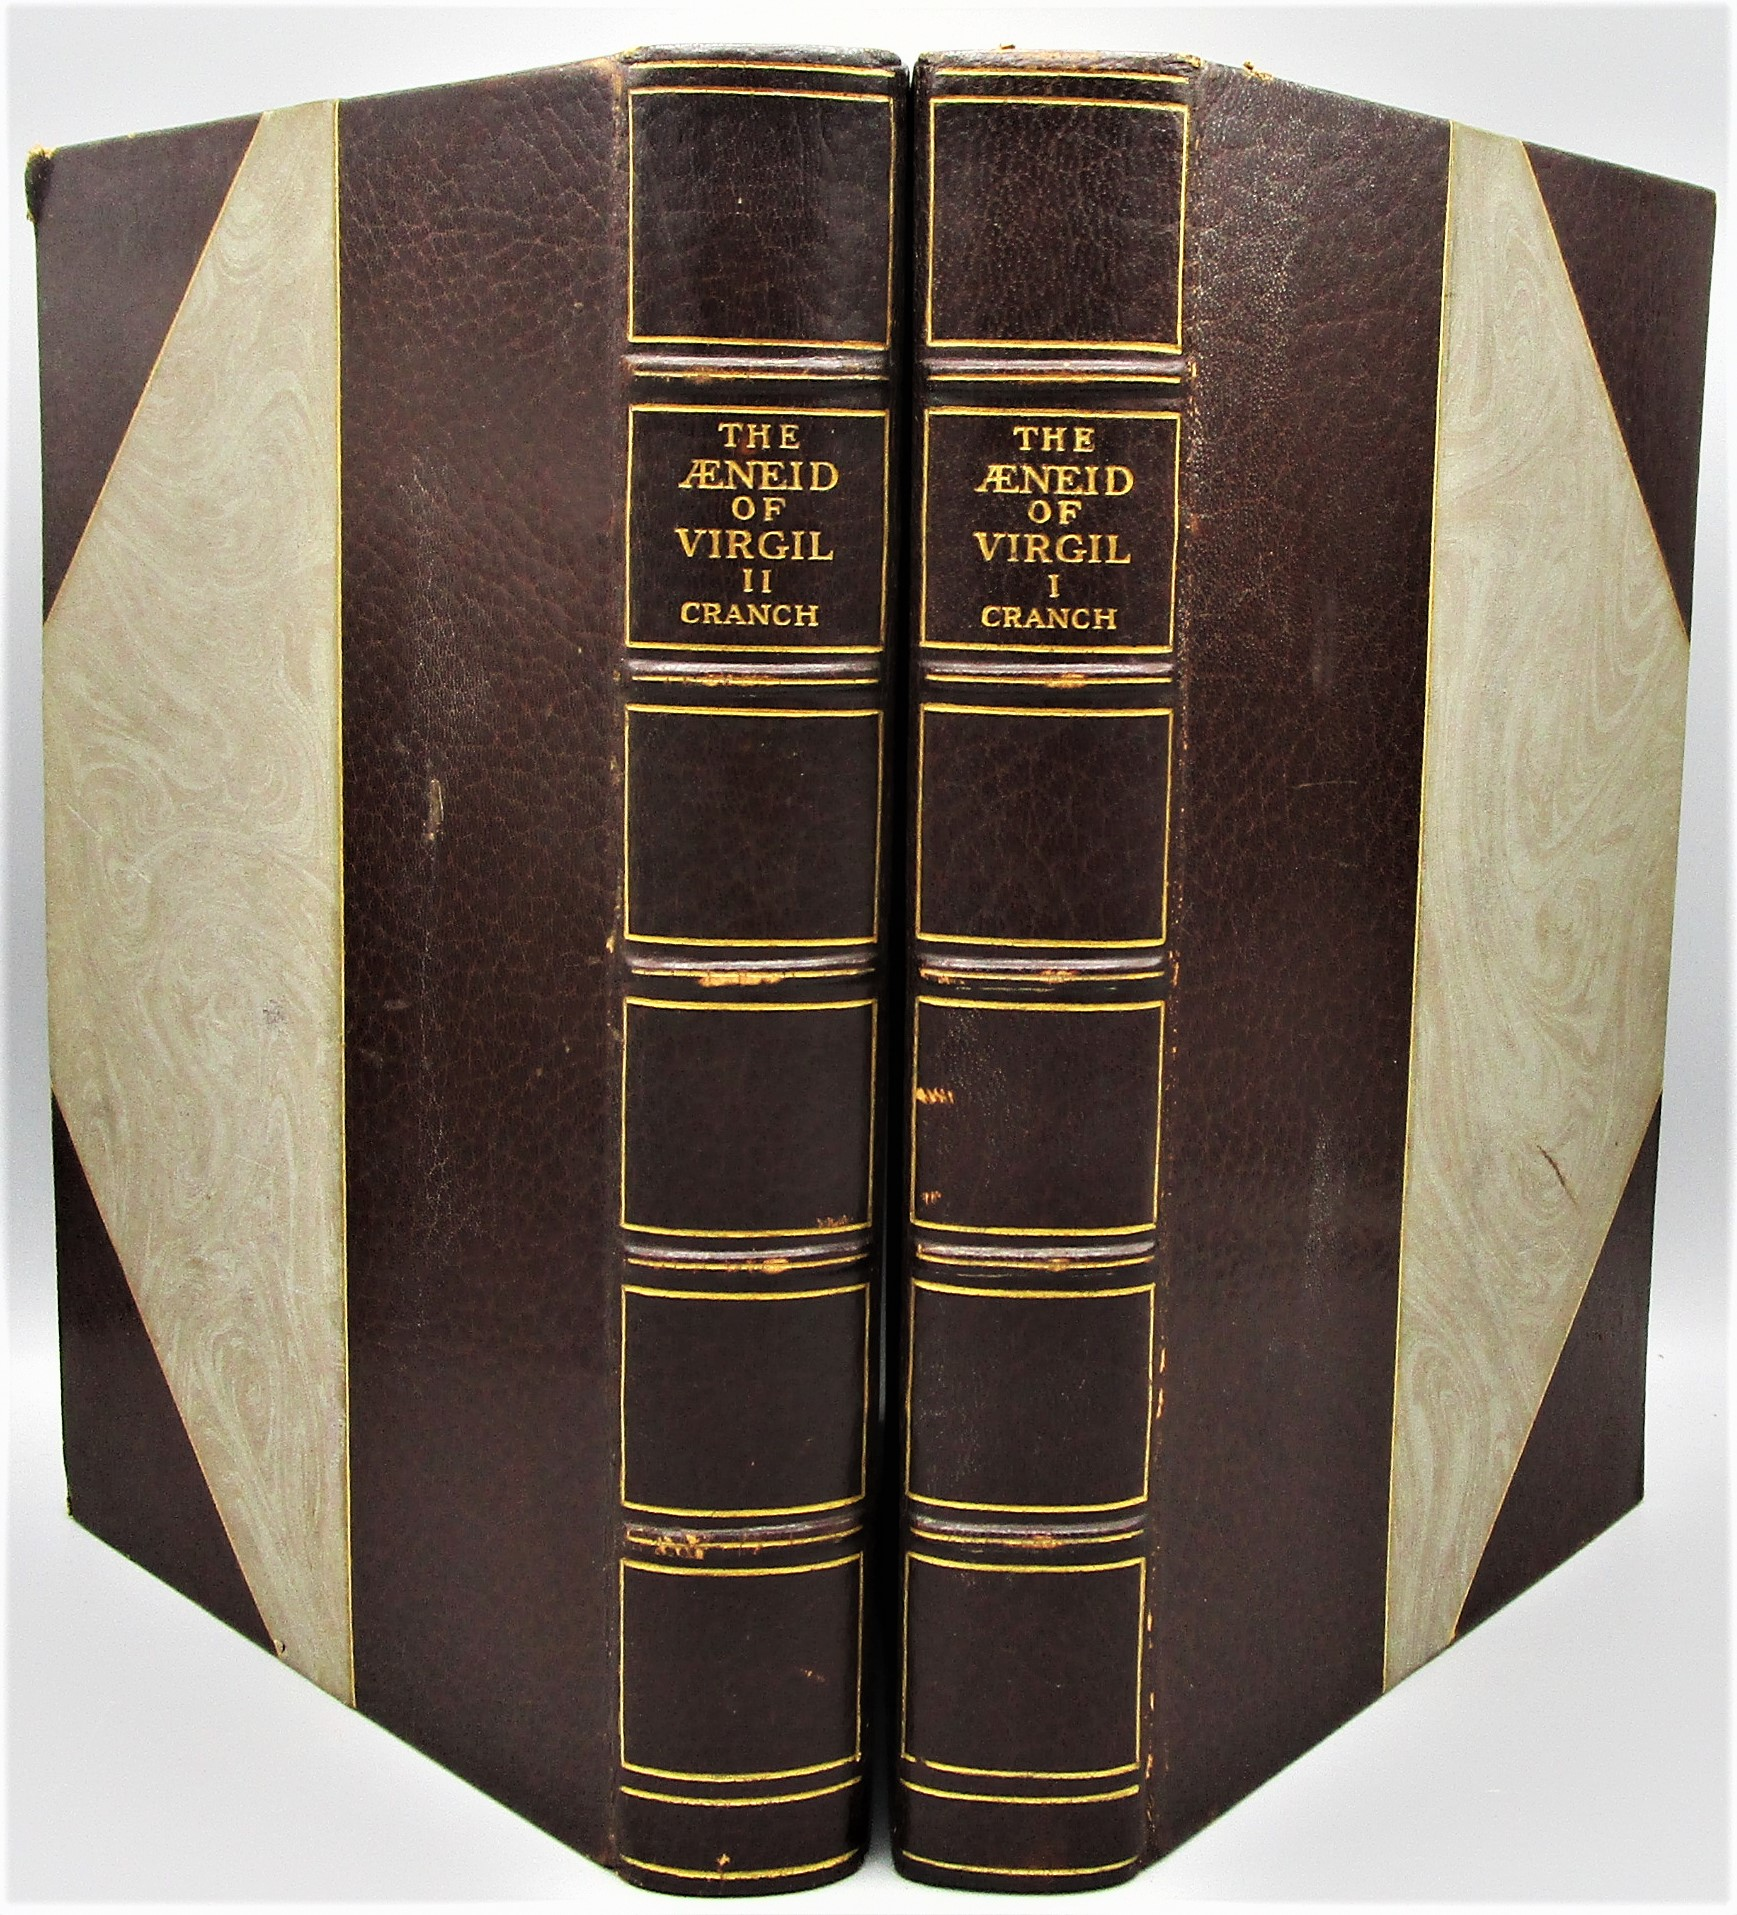 THE AENEID OF VIRGIL, by C.P. Cranch (tr) - 1906 [Ltd Ed; 2 Vols]